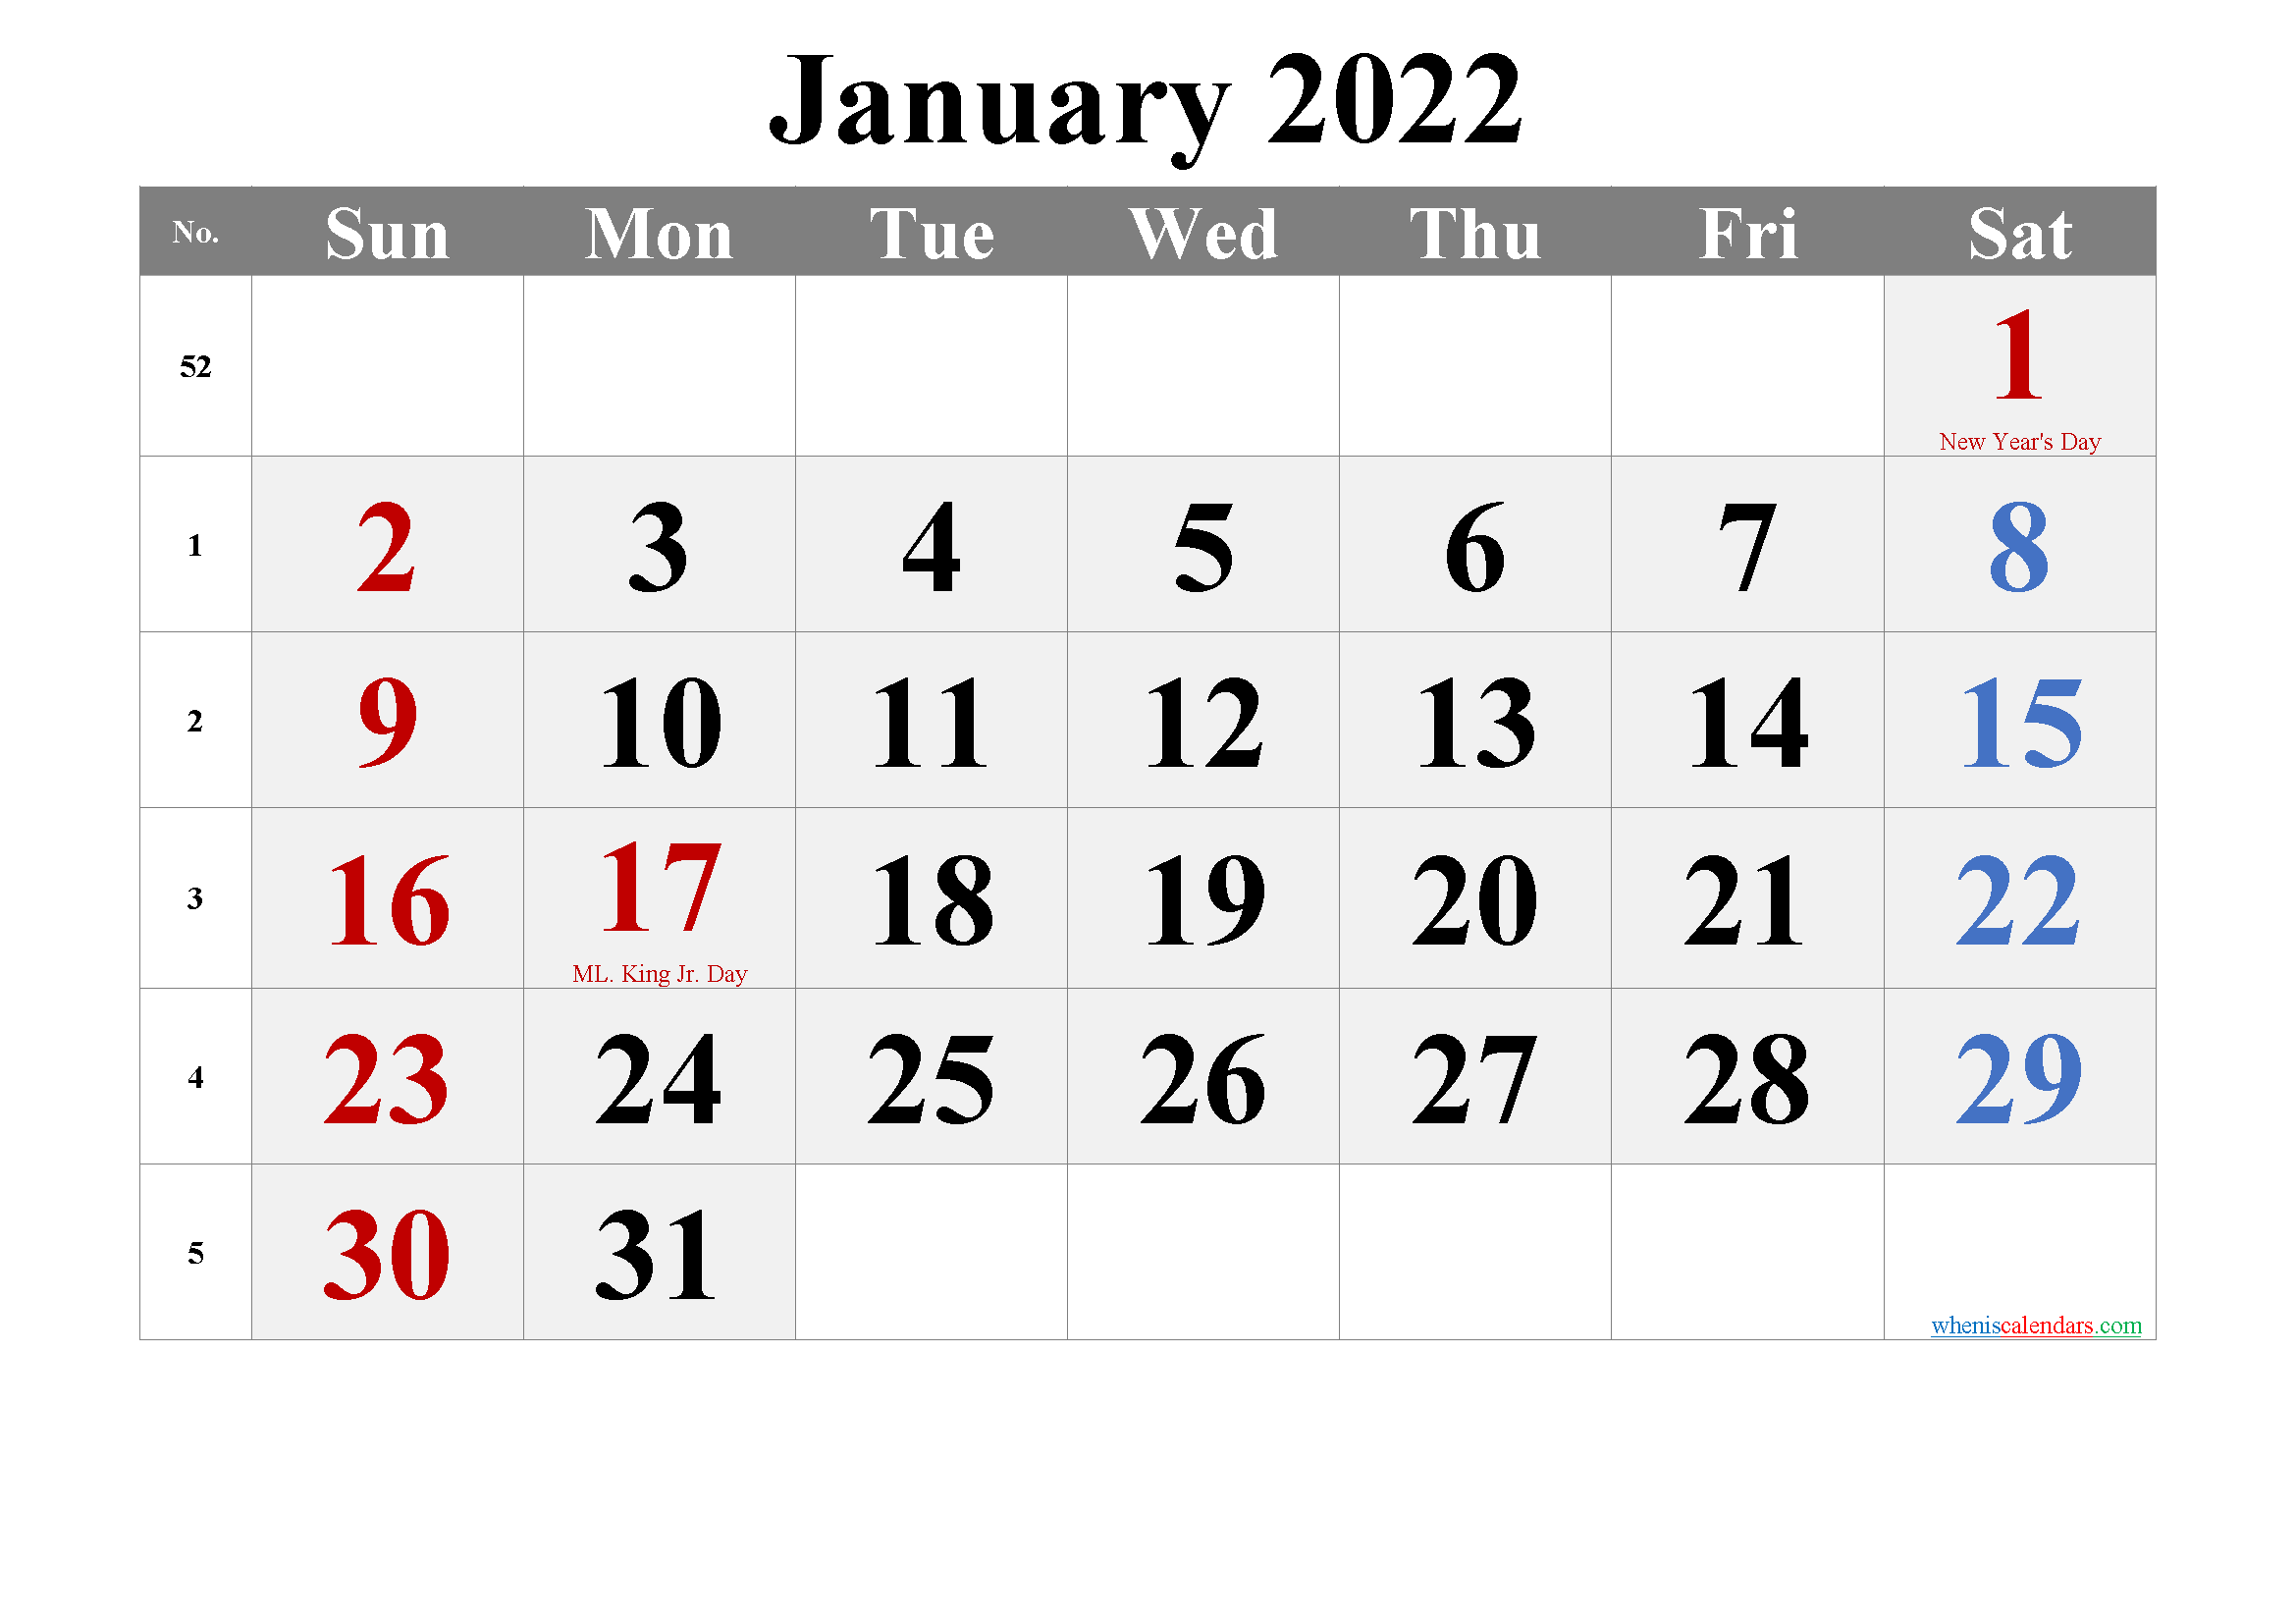 JANUARY 2022 Printable Calendar with Holidays